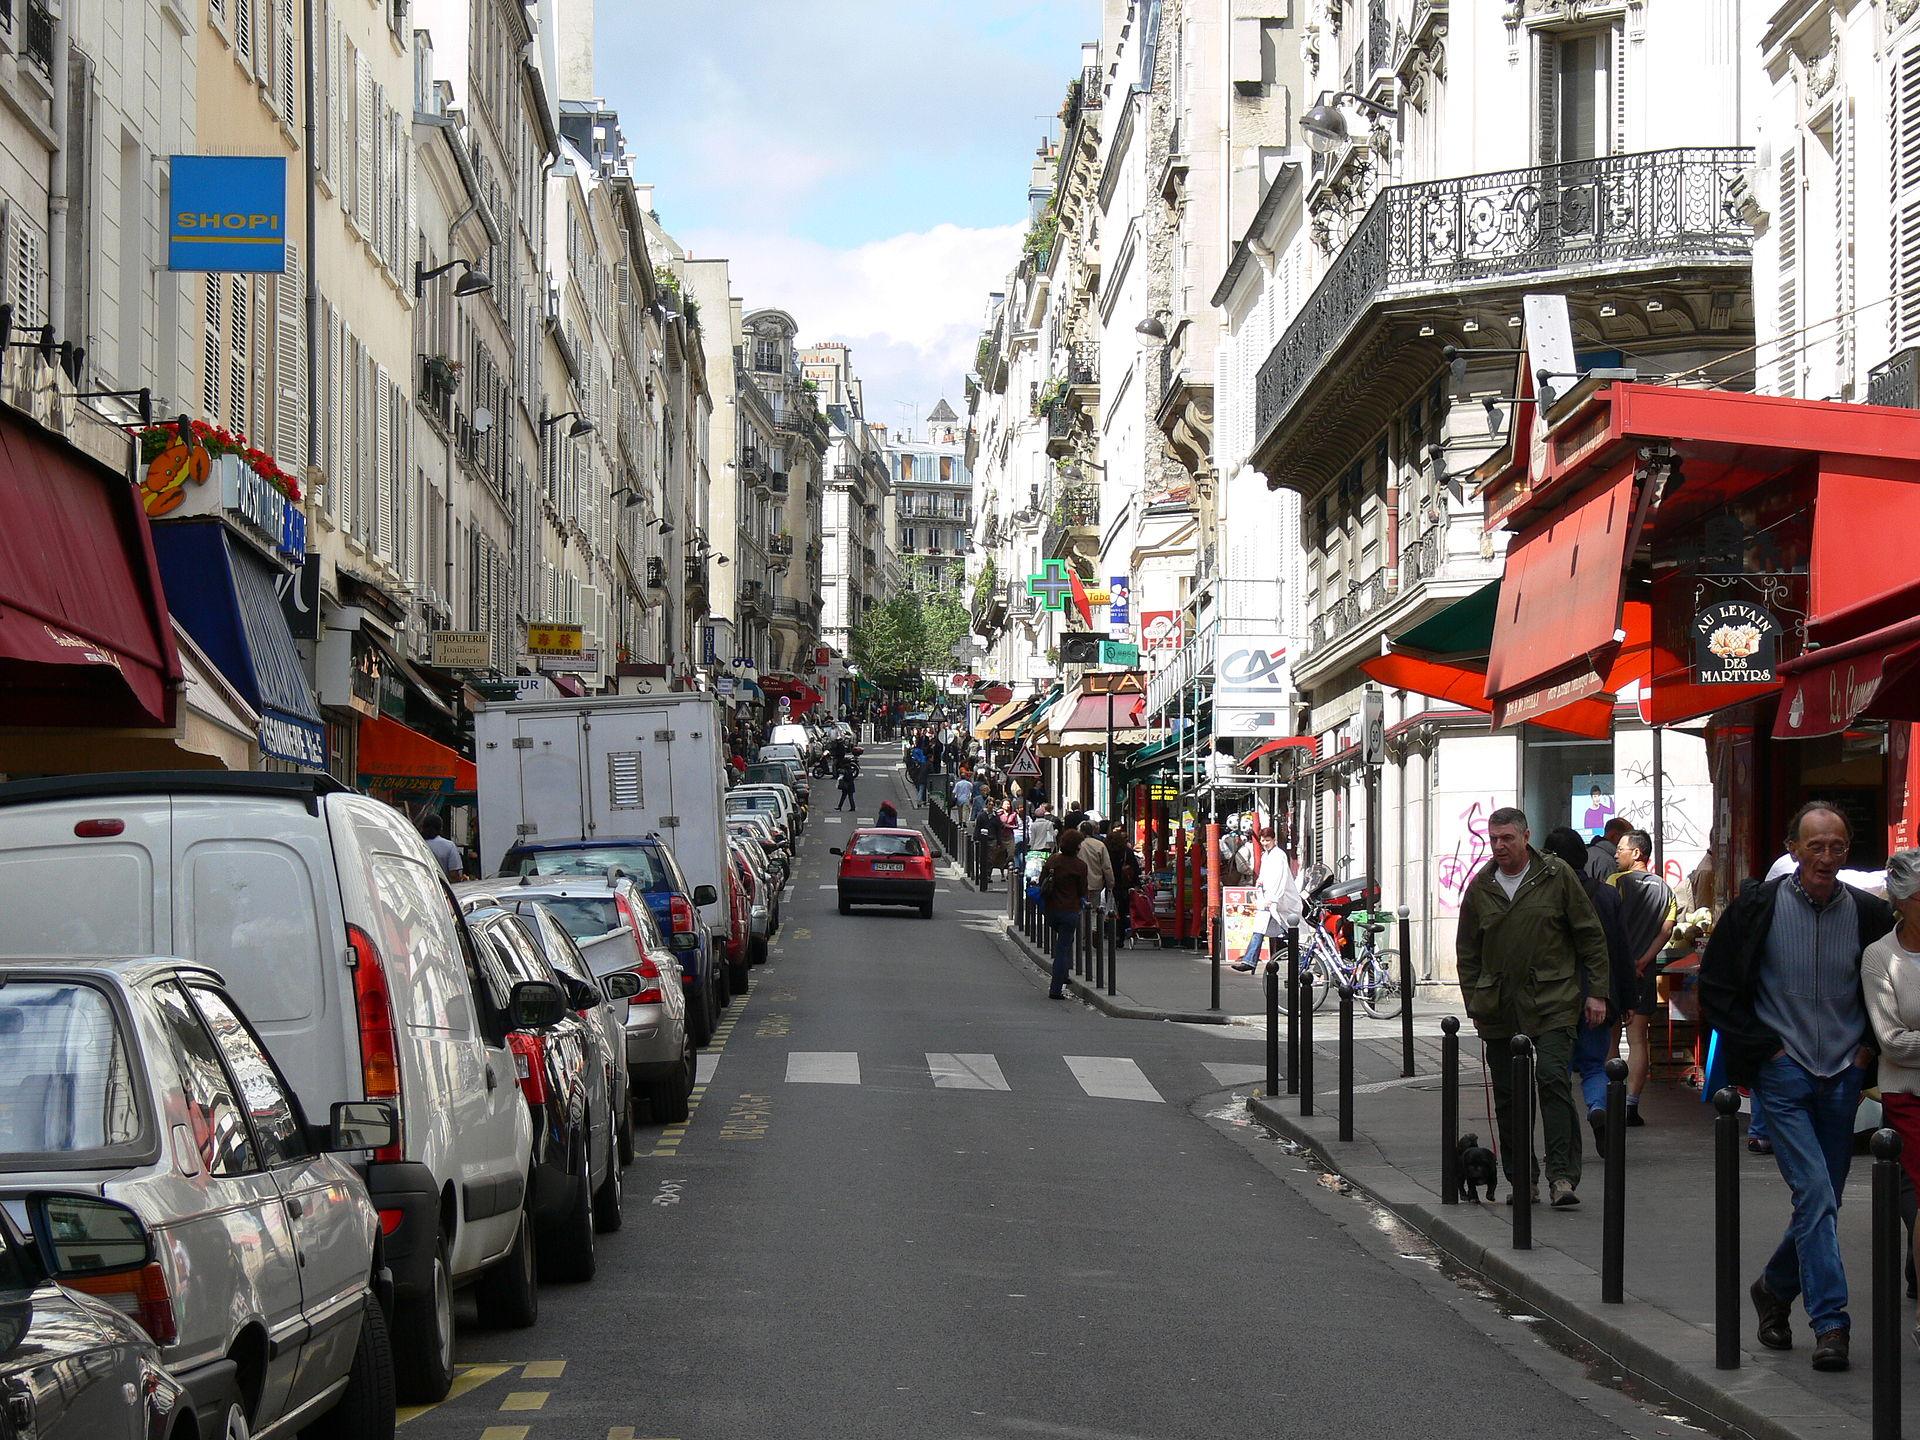 Rue des martyrs paris wikipedia for Miroir rue des martyrs